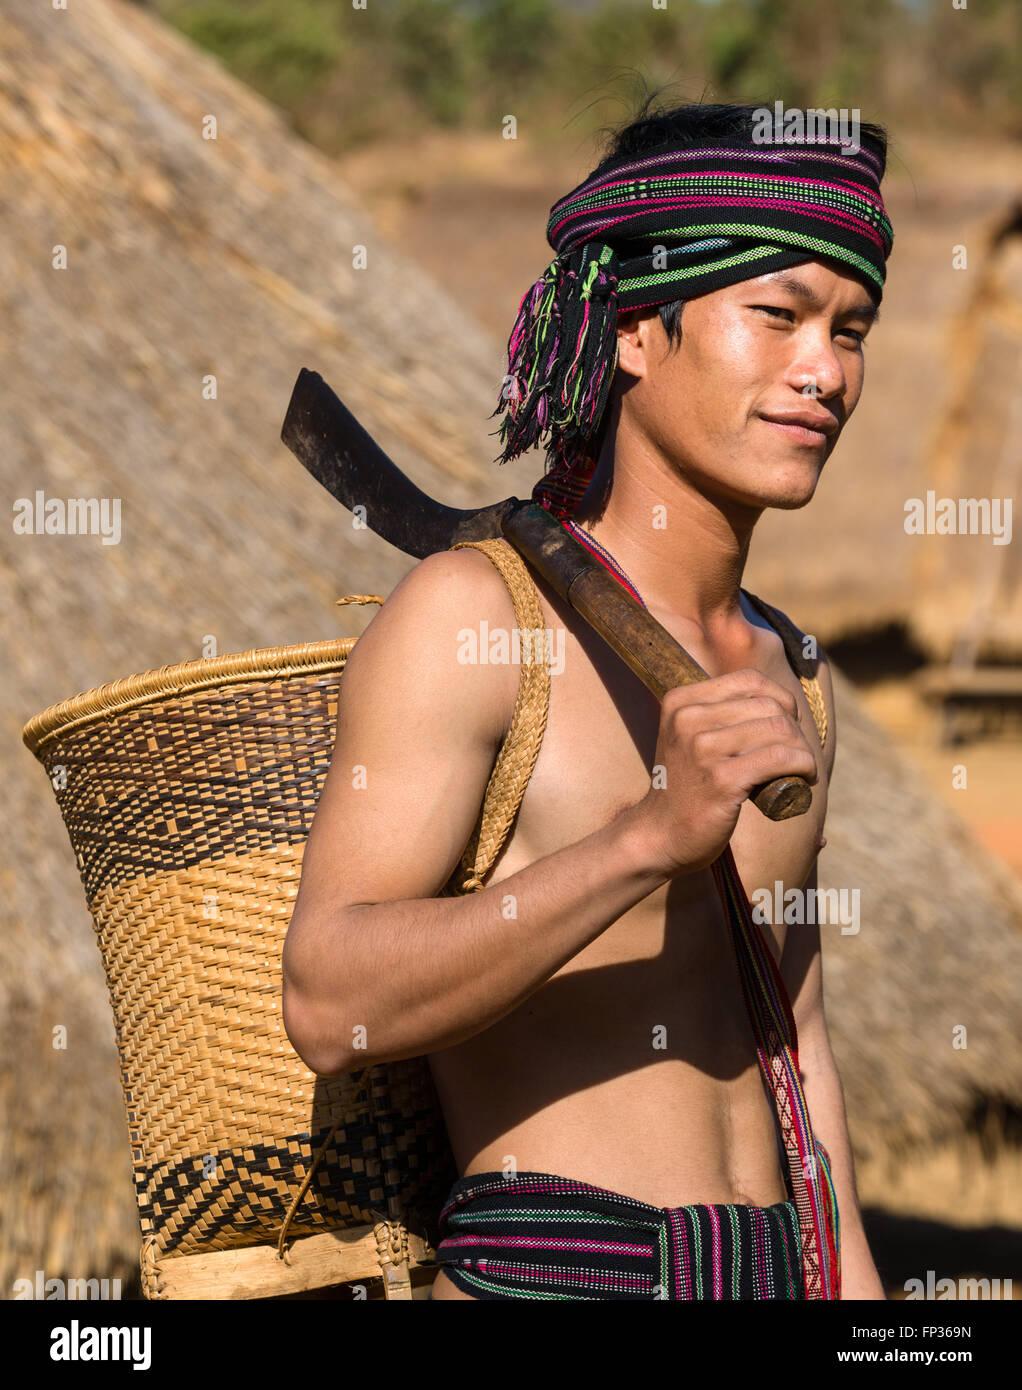 Mann in Tracht, ethnische Minderheit, Pnong, Bunong, Senmonorom, Sen Monorom, Provinz Mondulkiri, Kambodscha Stockbild